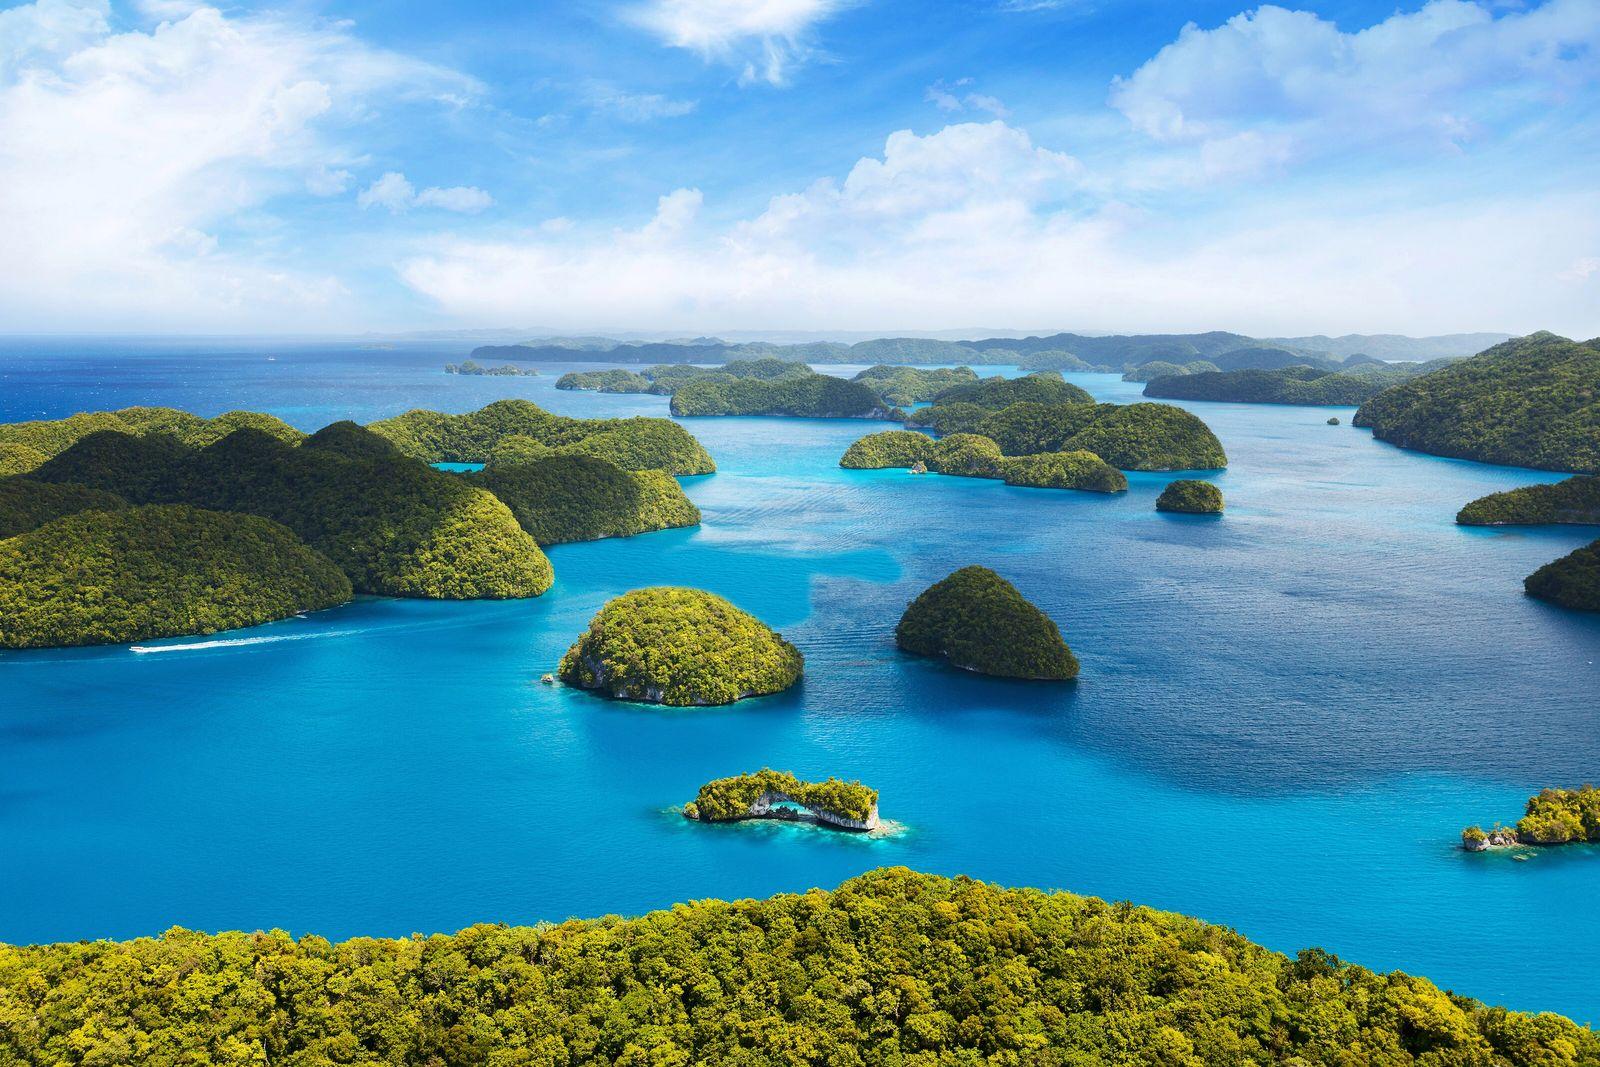 Inseln des Inselstaats Palau